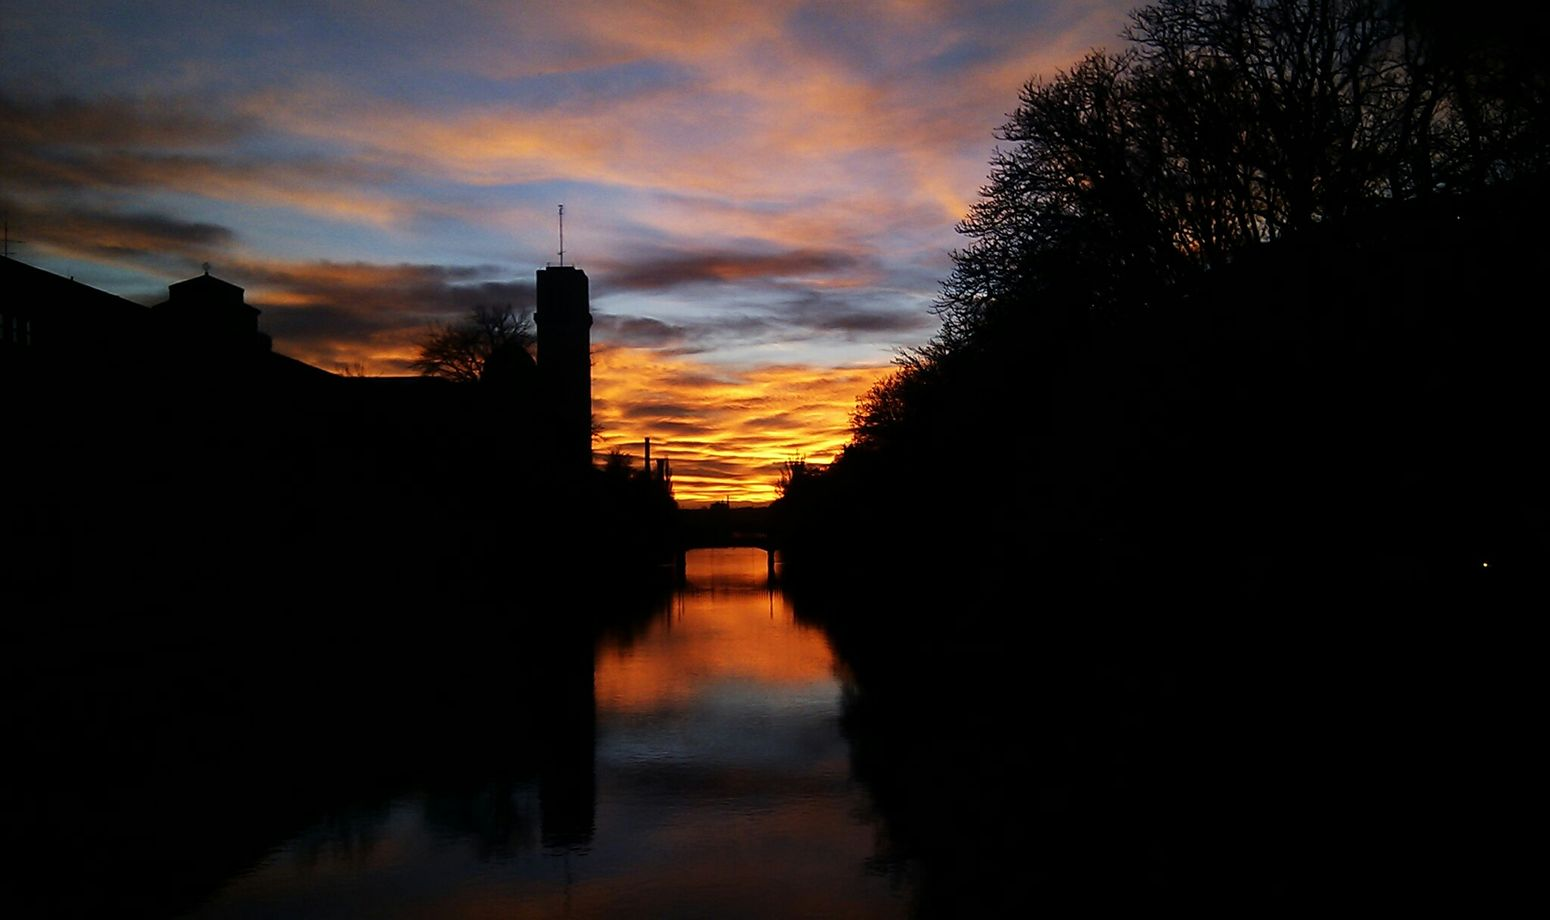 Munichskys Shadow Schatten Abendhimmel Water Reflections